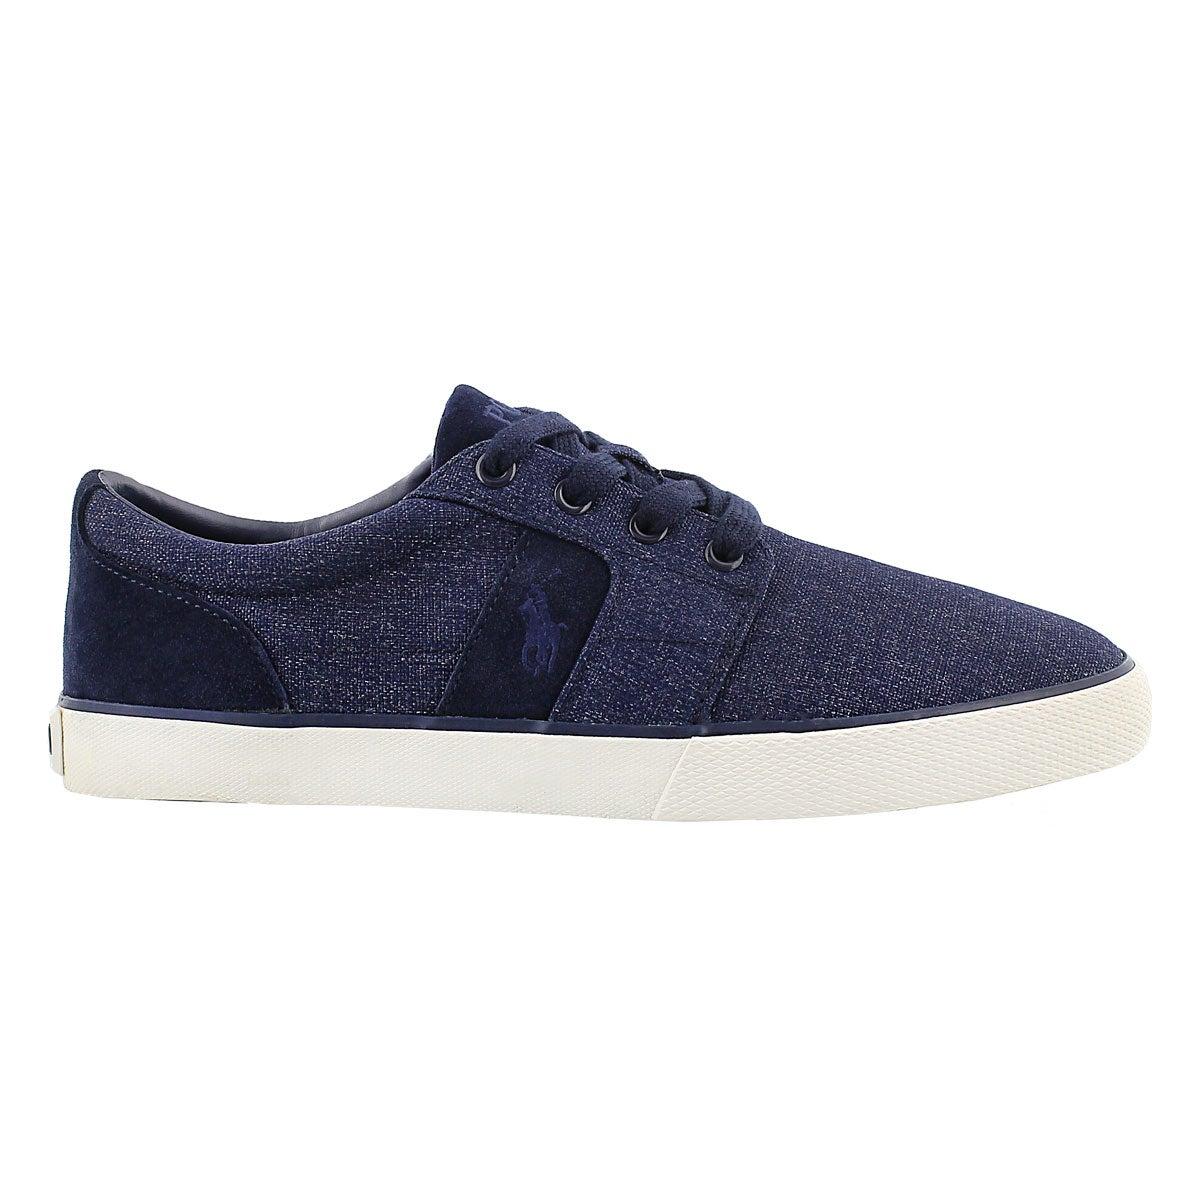 Mns Halmore navy suede/nylon sneaker